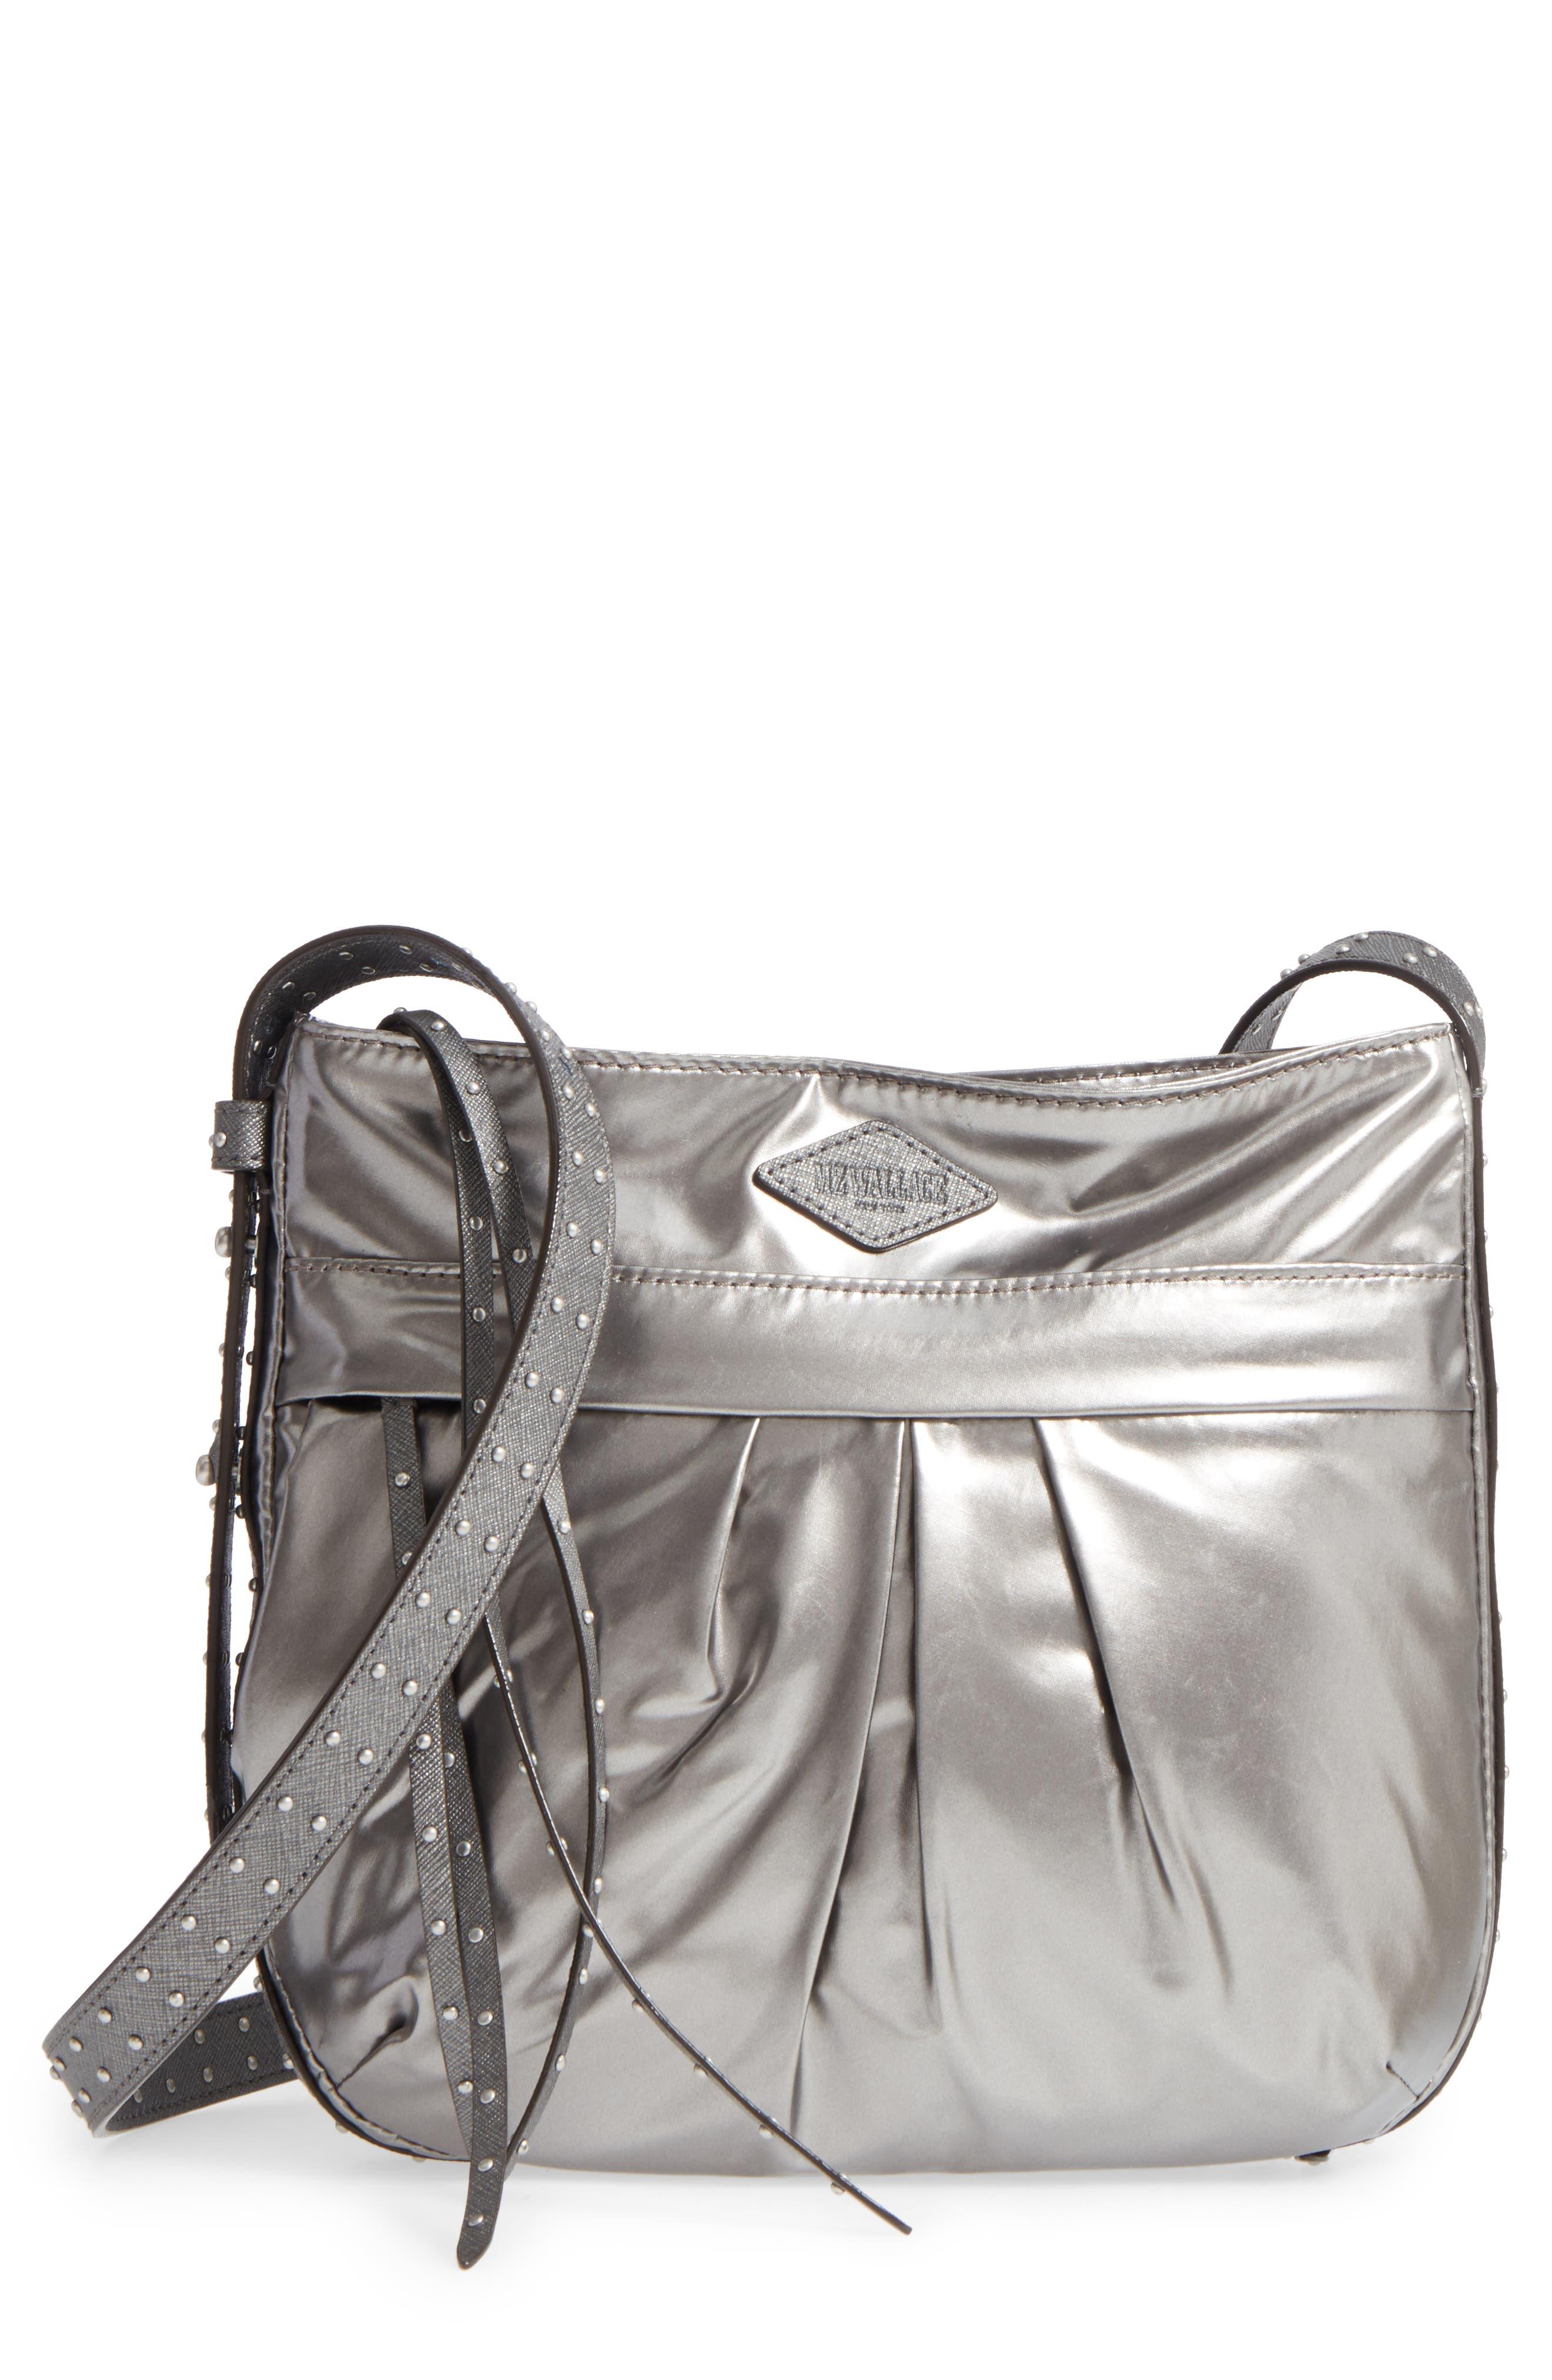 Harlow Crossbody Bag,                             Main thumbnail 1, color,                             048